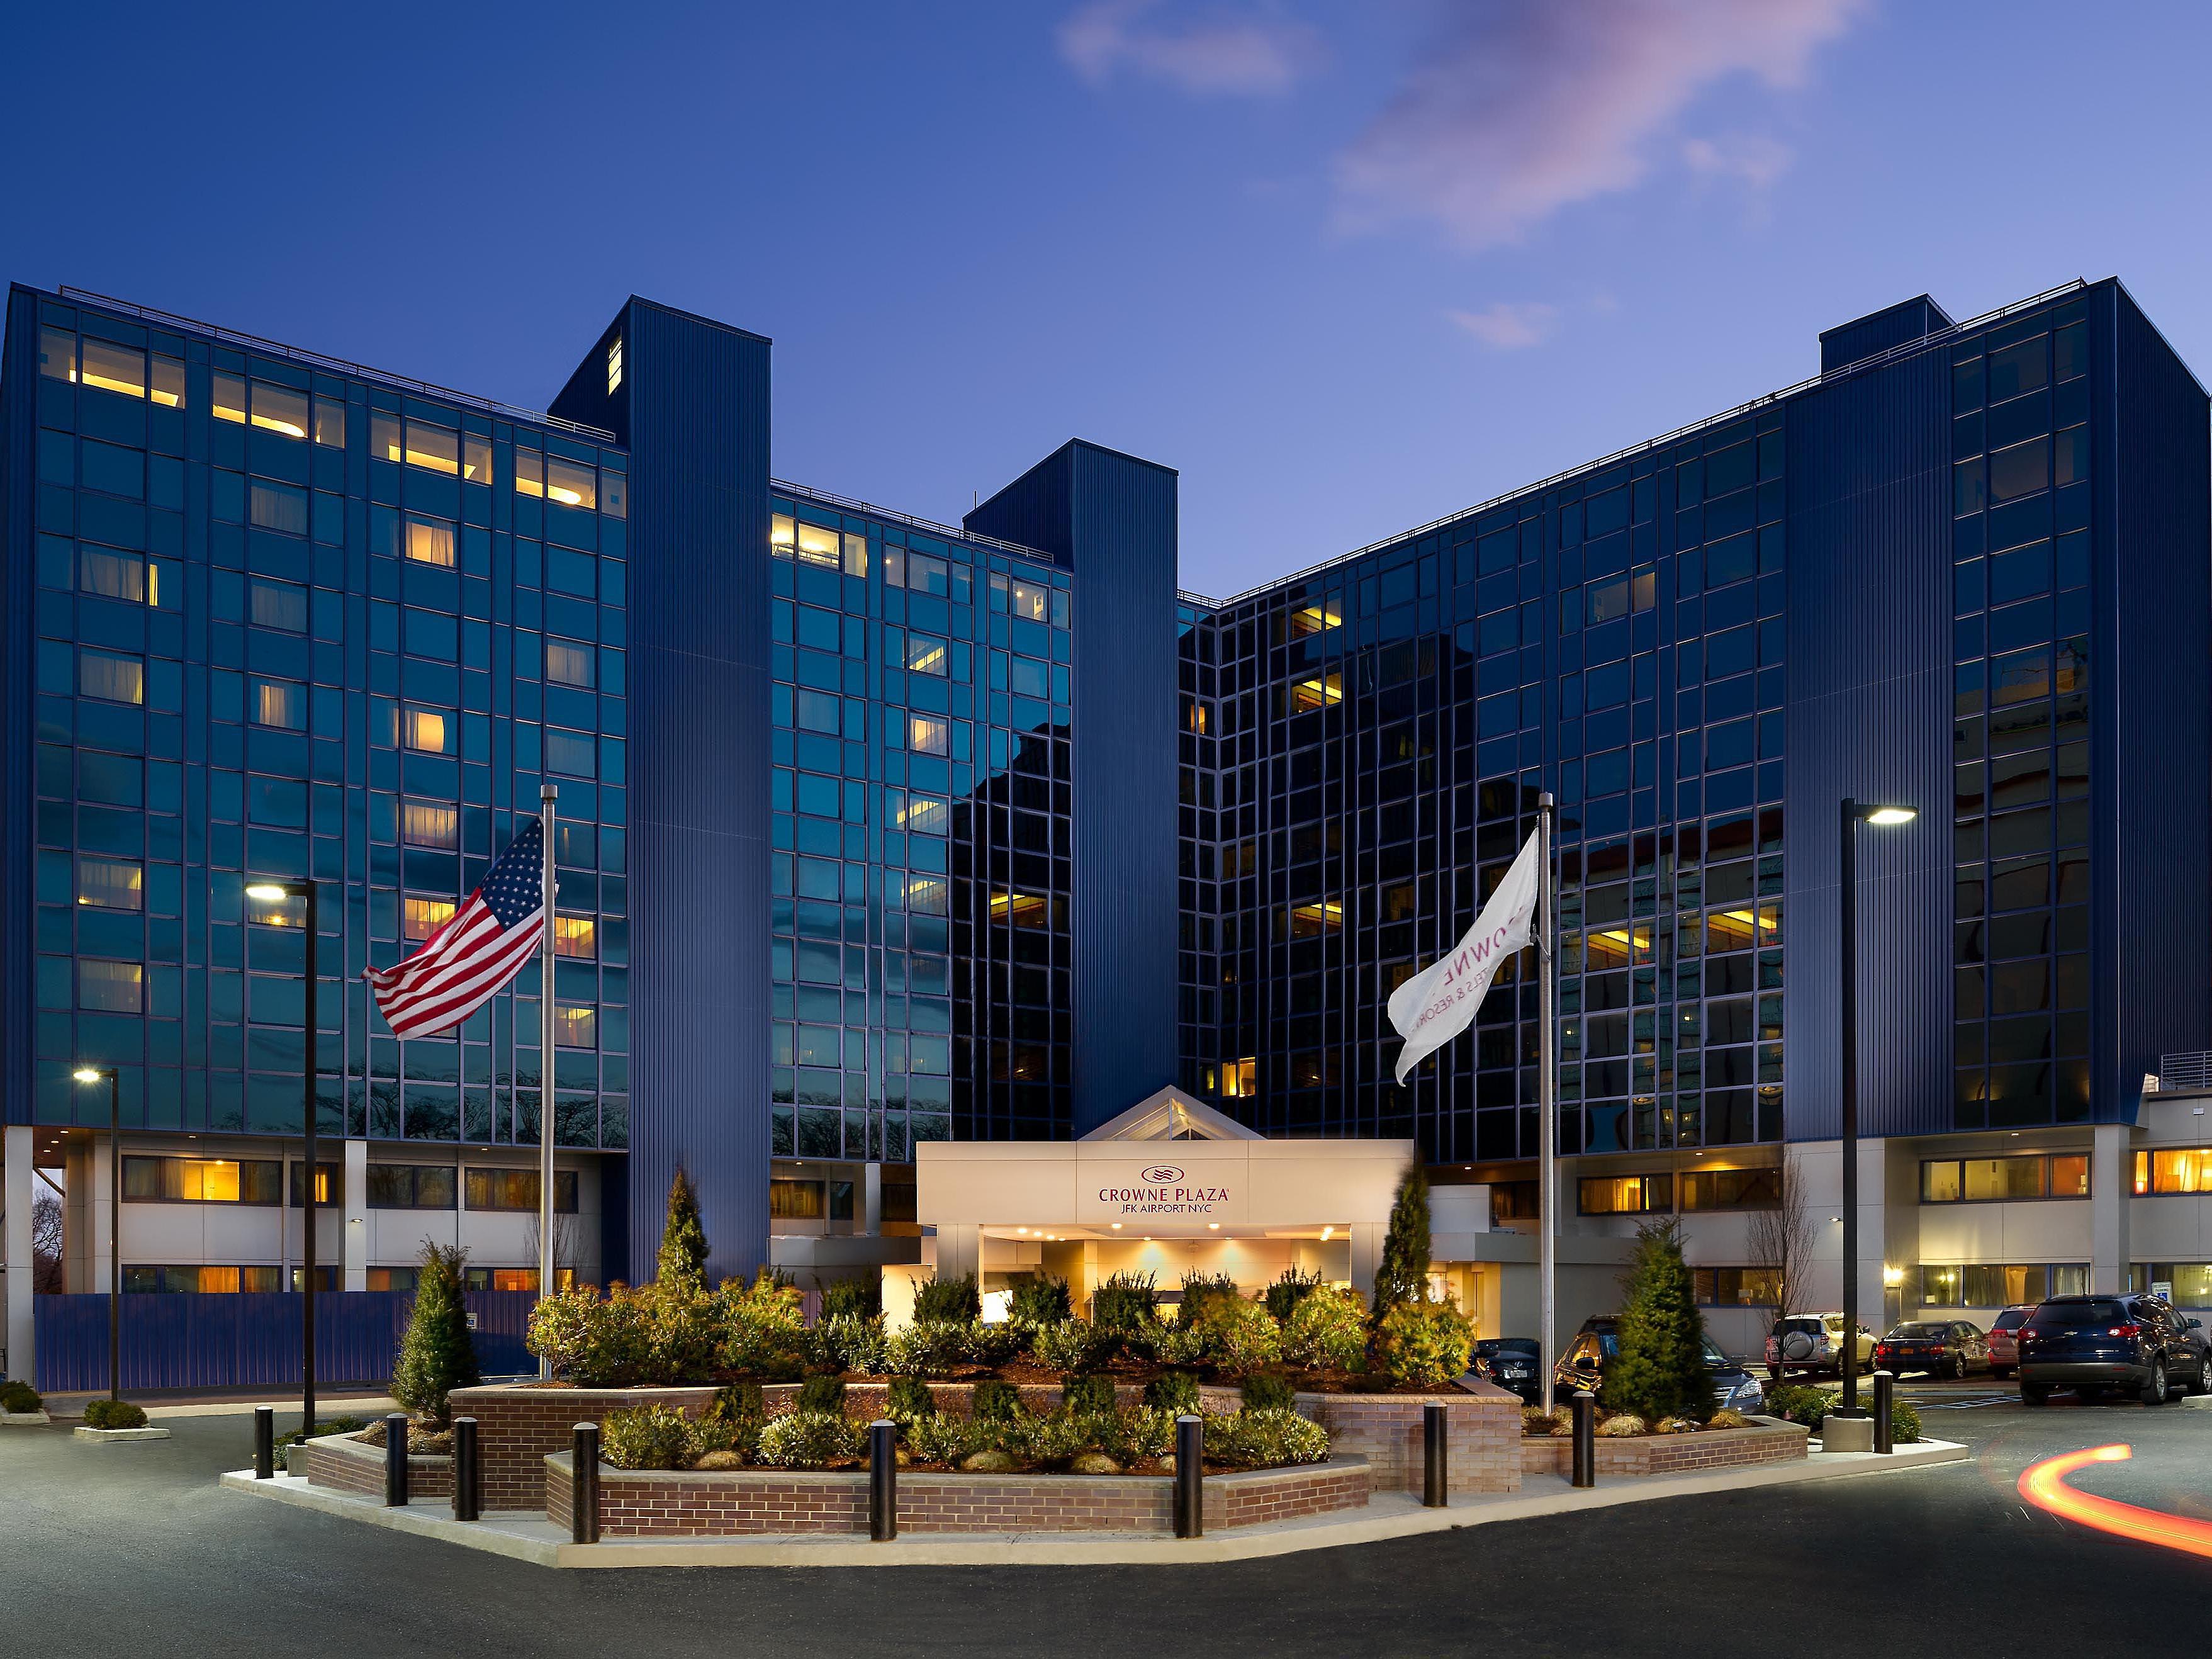 JFK Airport Hotels in Jamaica, Queens   Crowne Plaza JFK